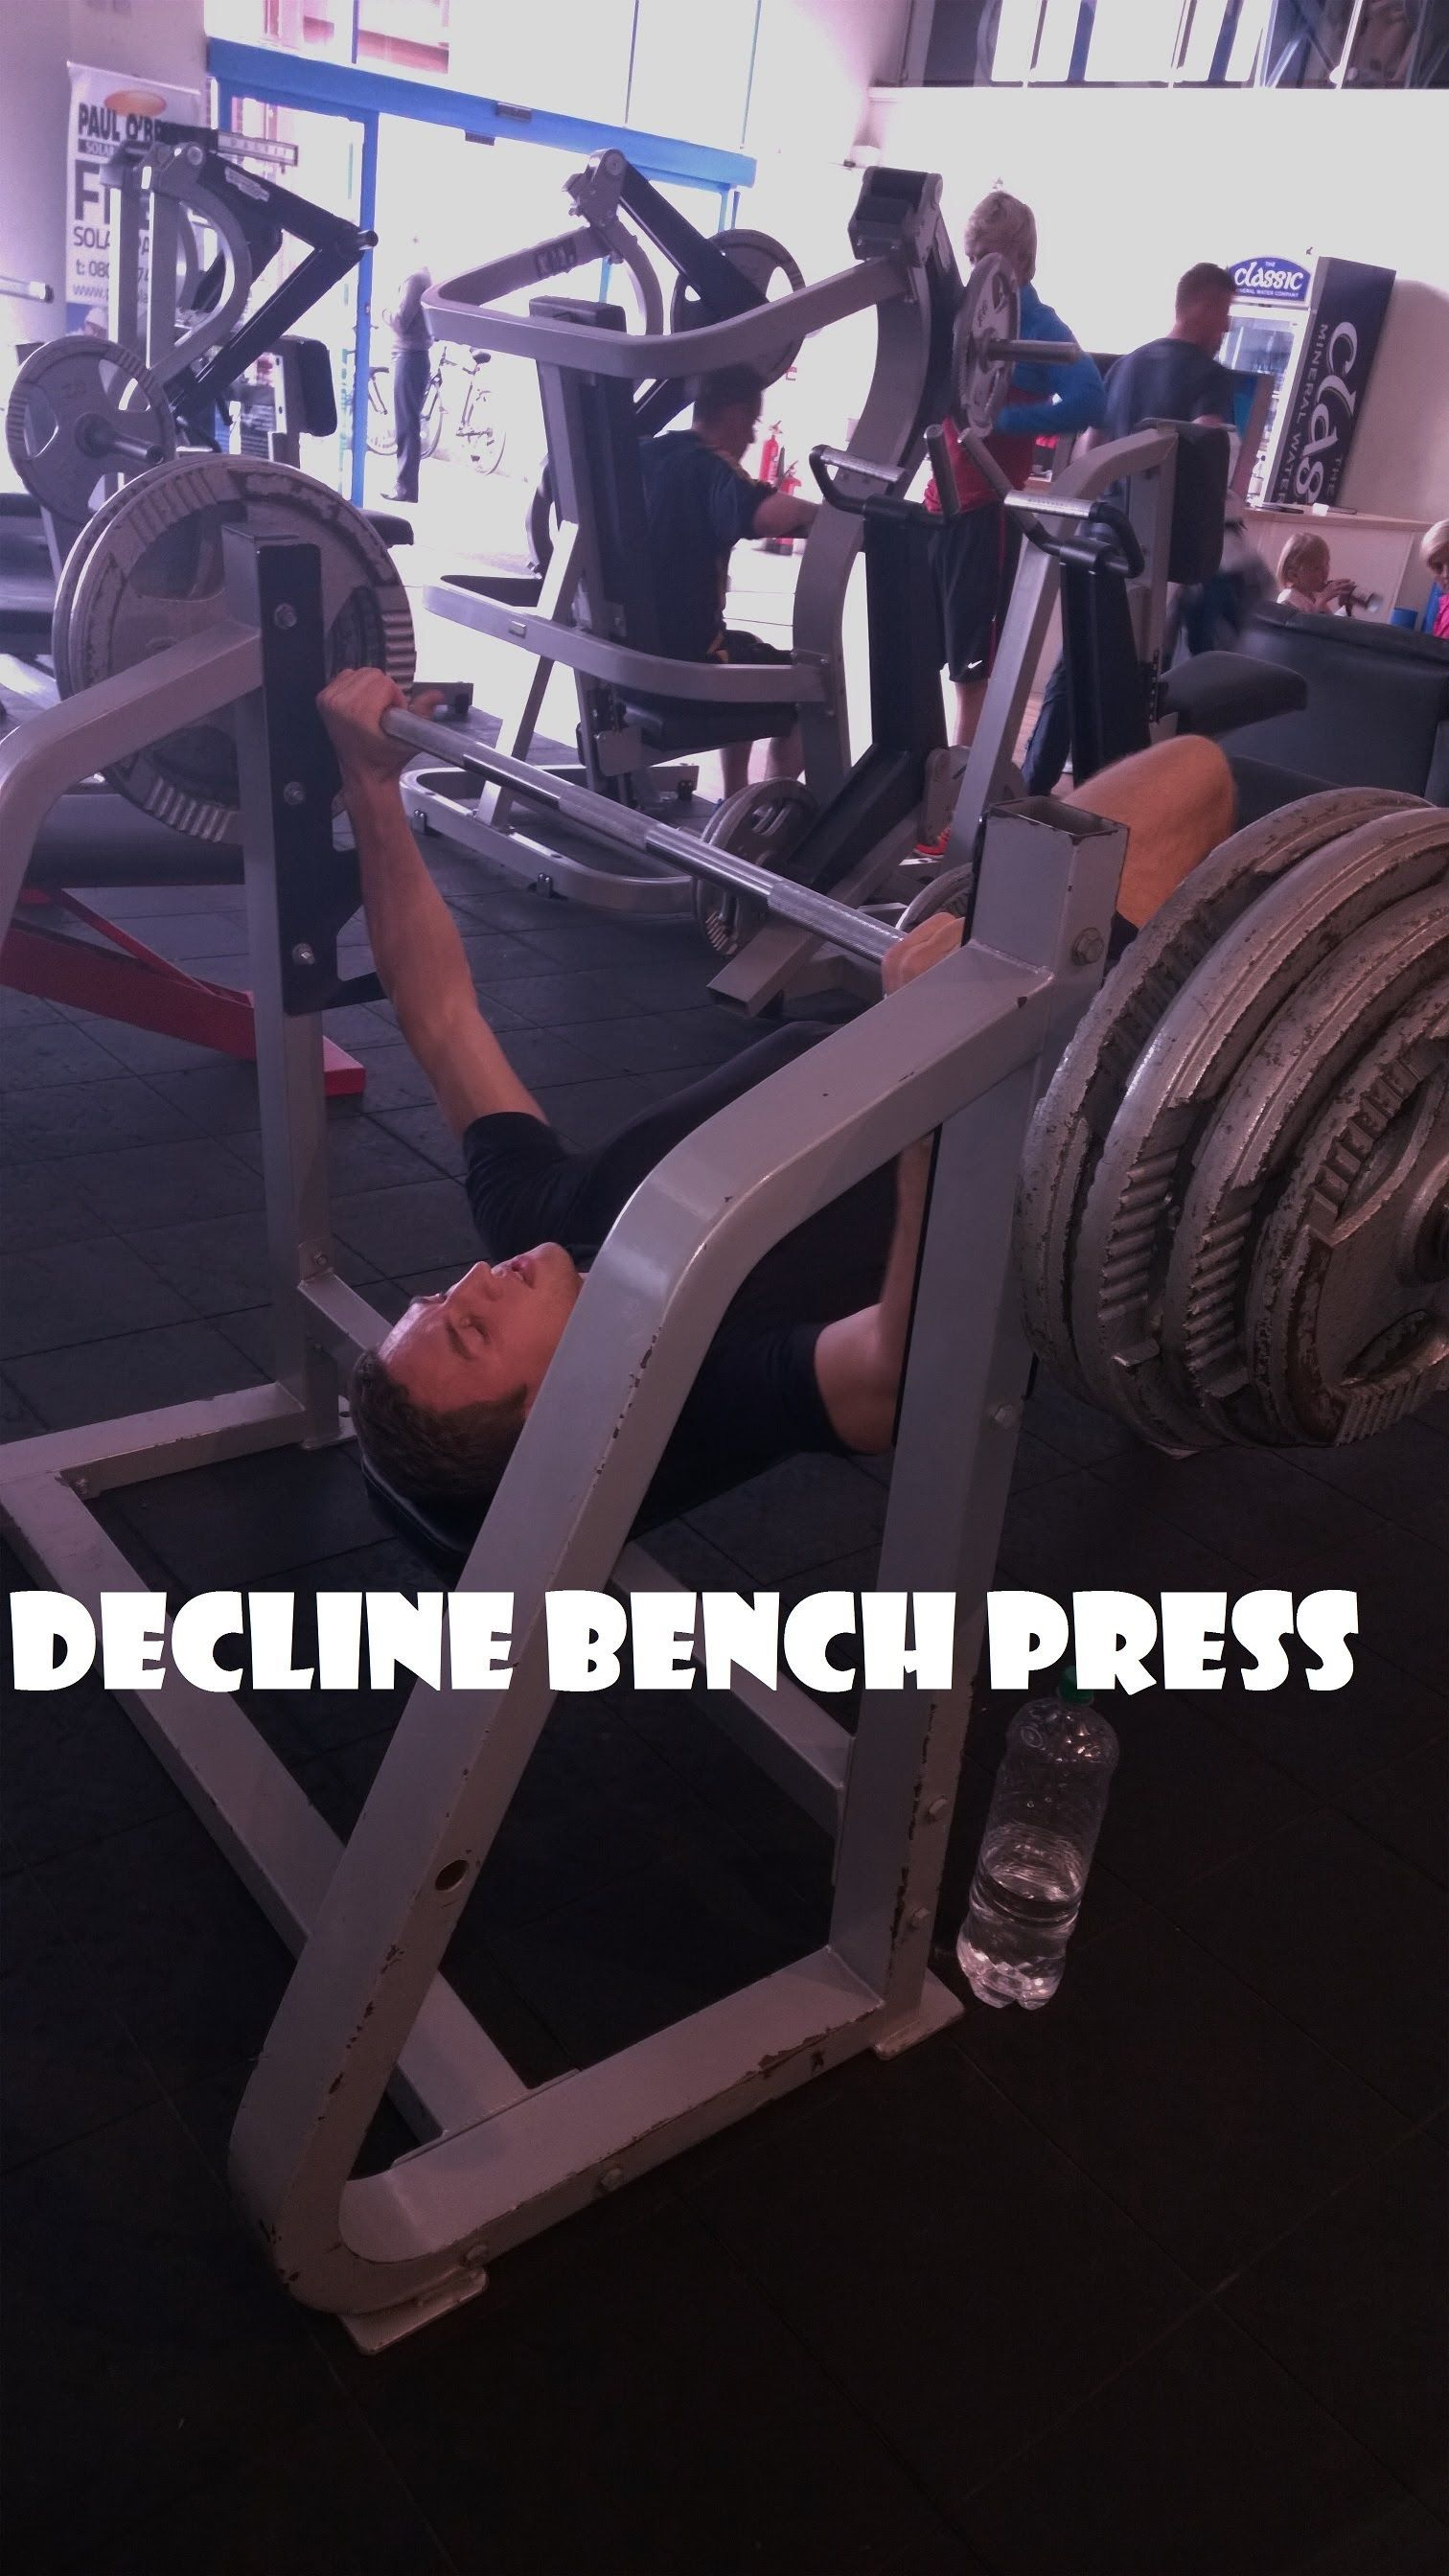 Decline bench press 150 kg 330 lbs 2 drop sets